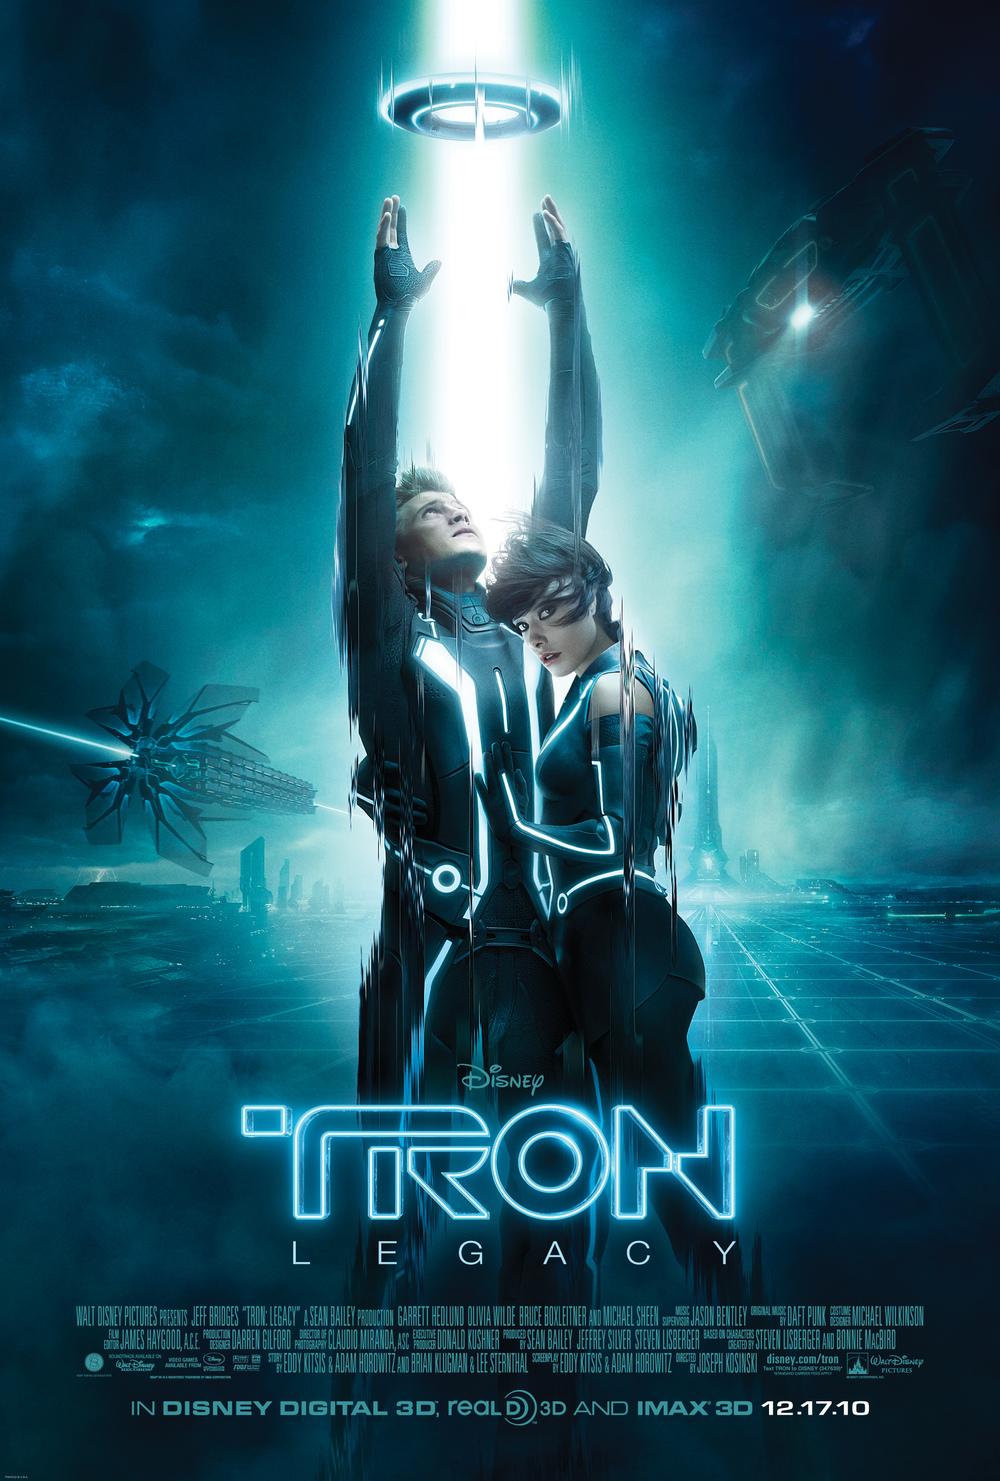 tron_legacy_final_poster_hi-res_01.jpg